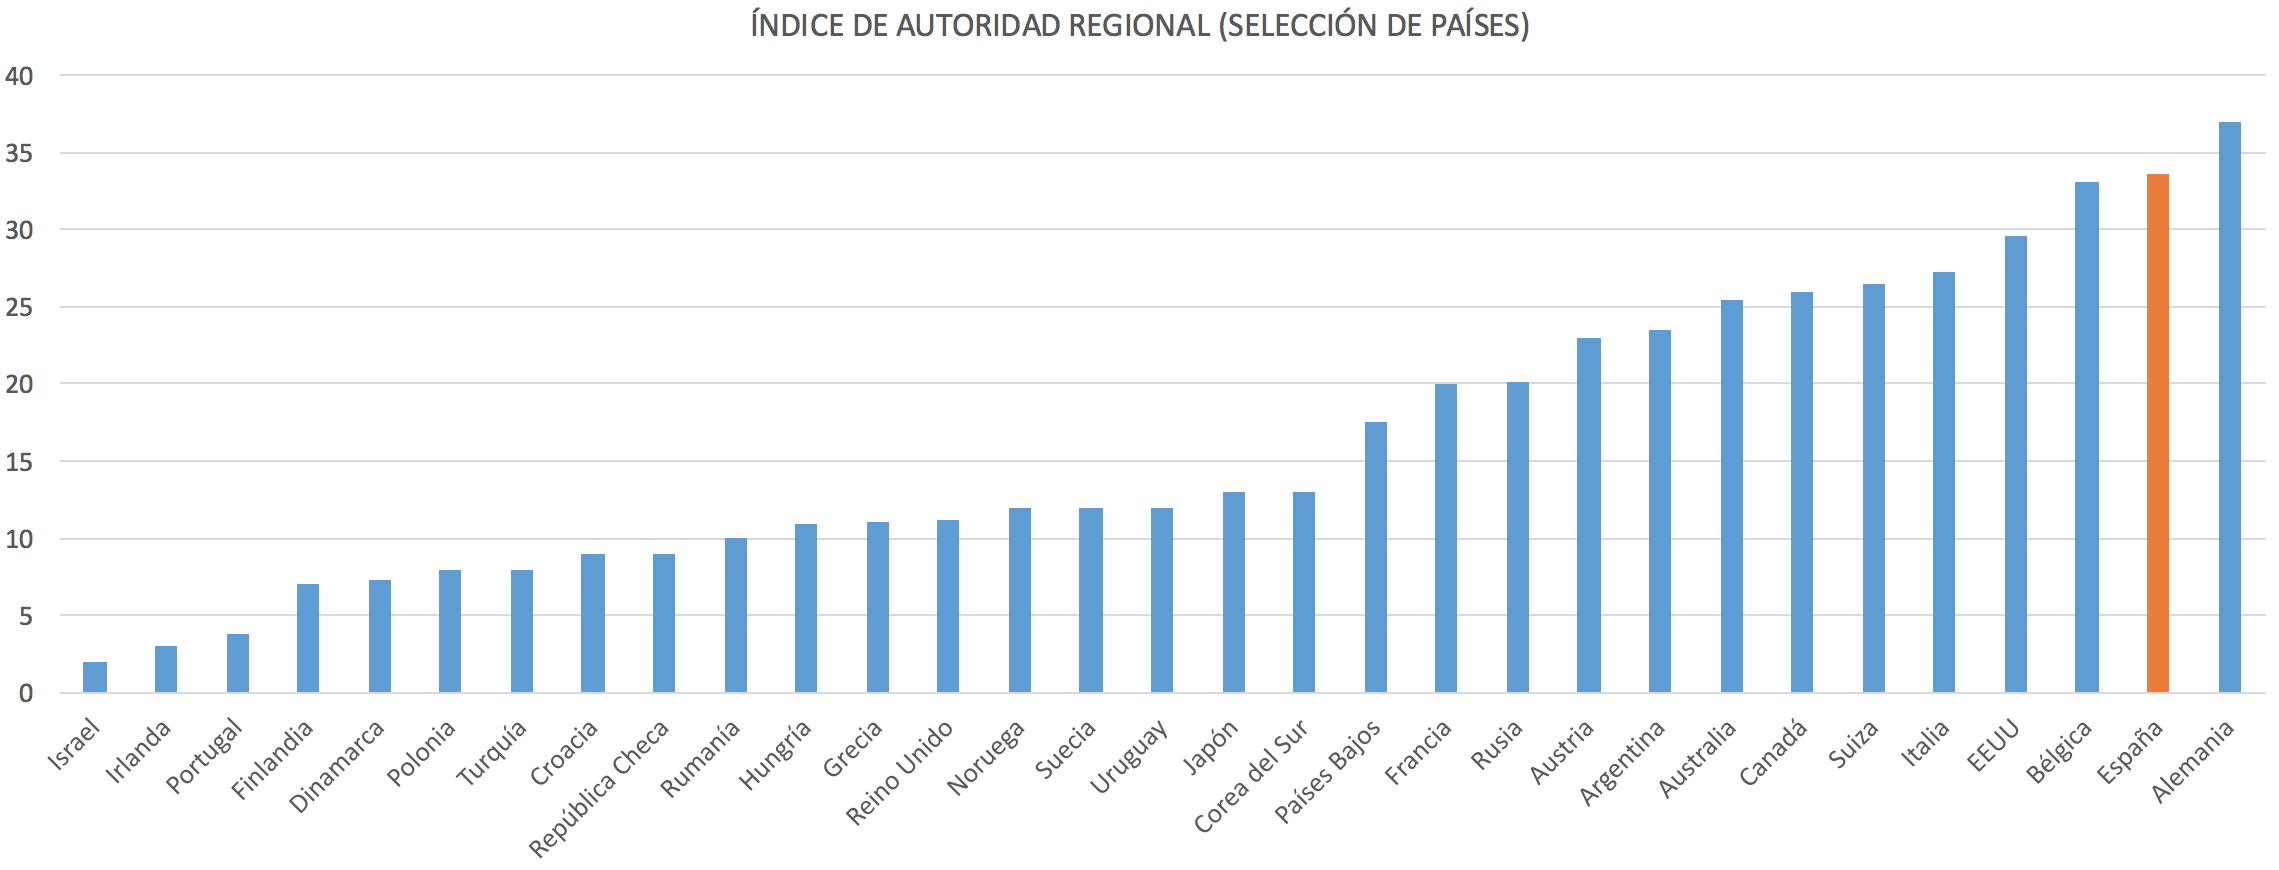 2-Indice-descentralizacion-territorial.p